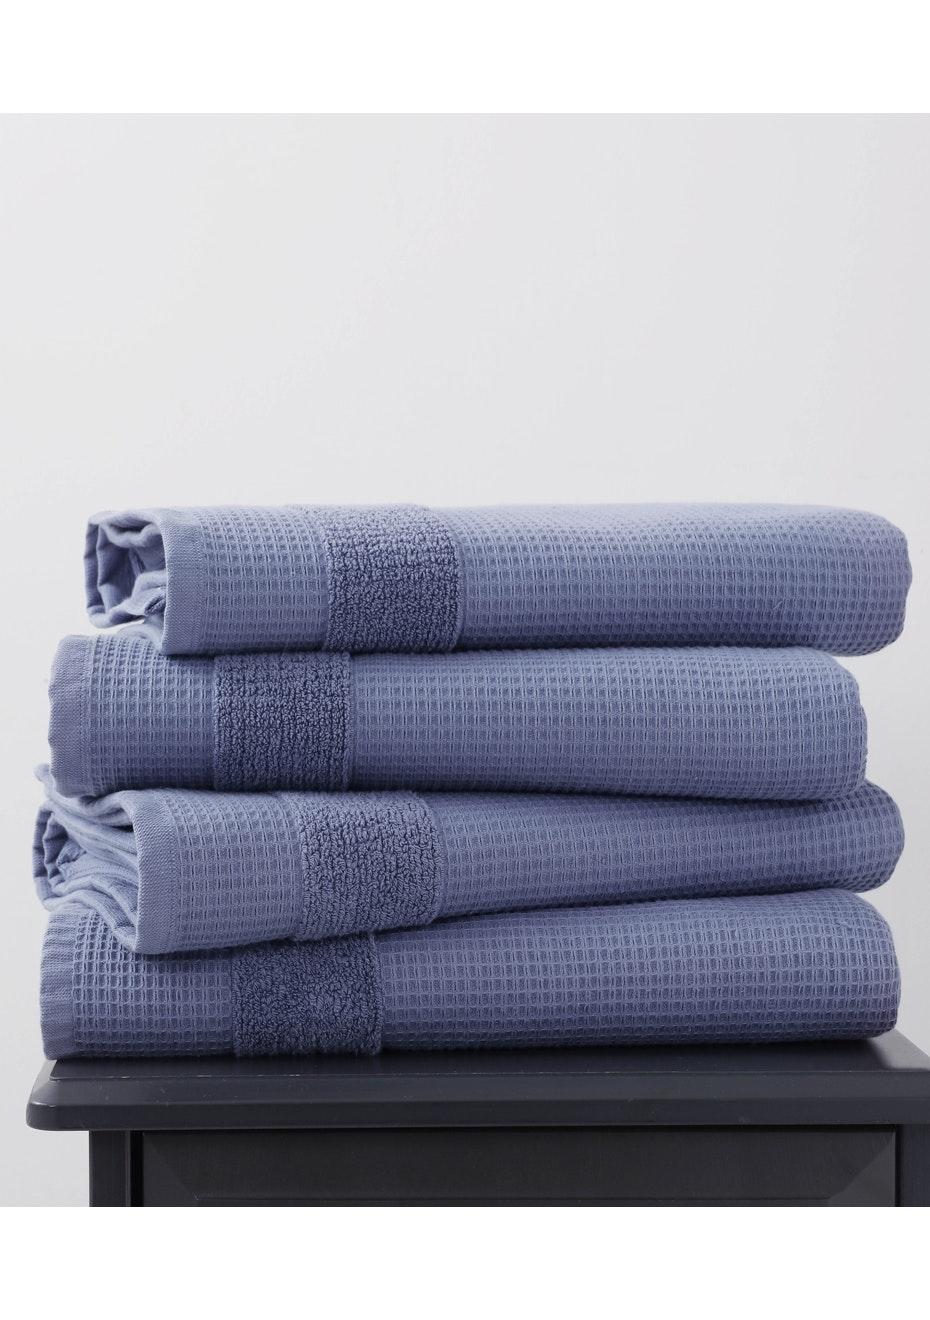 2 Pack Azurite 600gsm Waffle Bath Towel